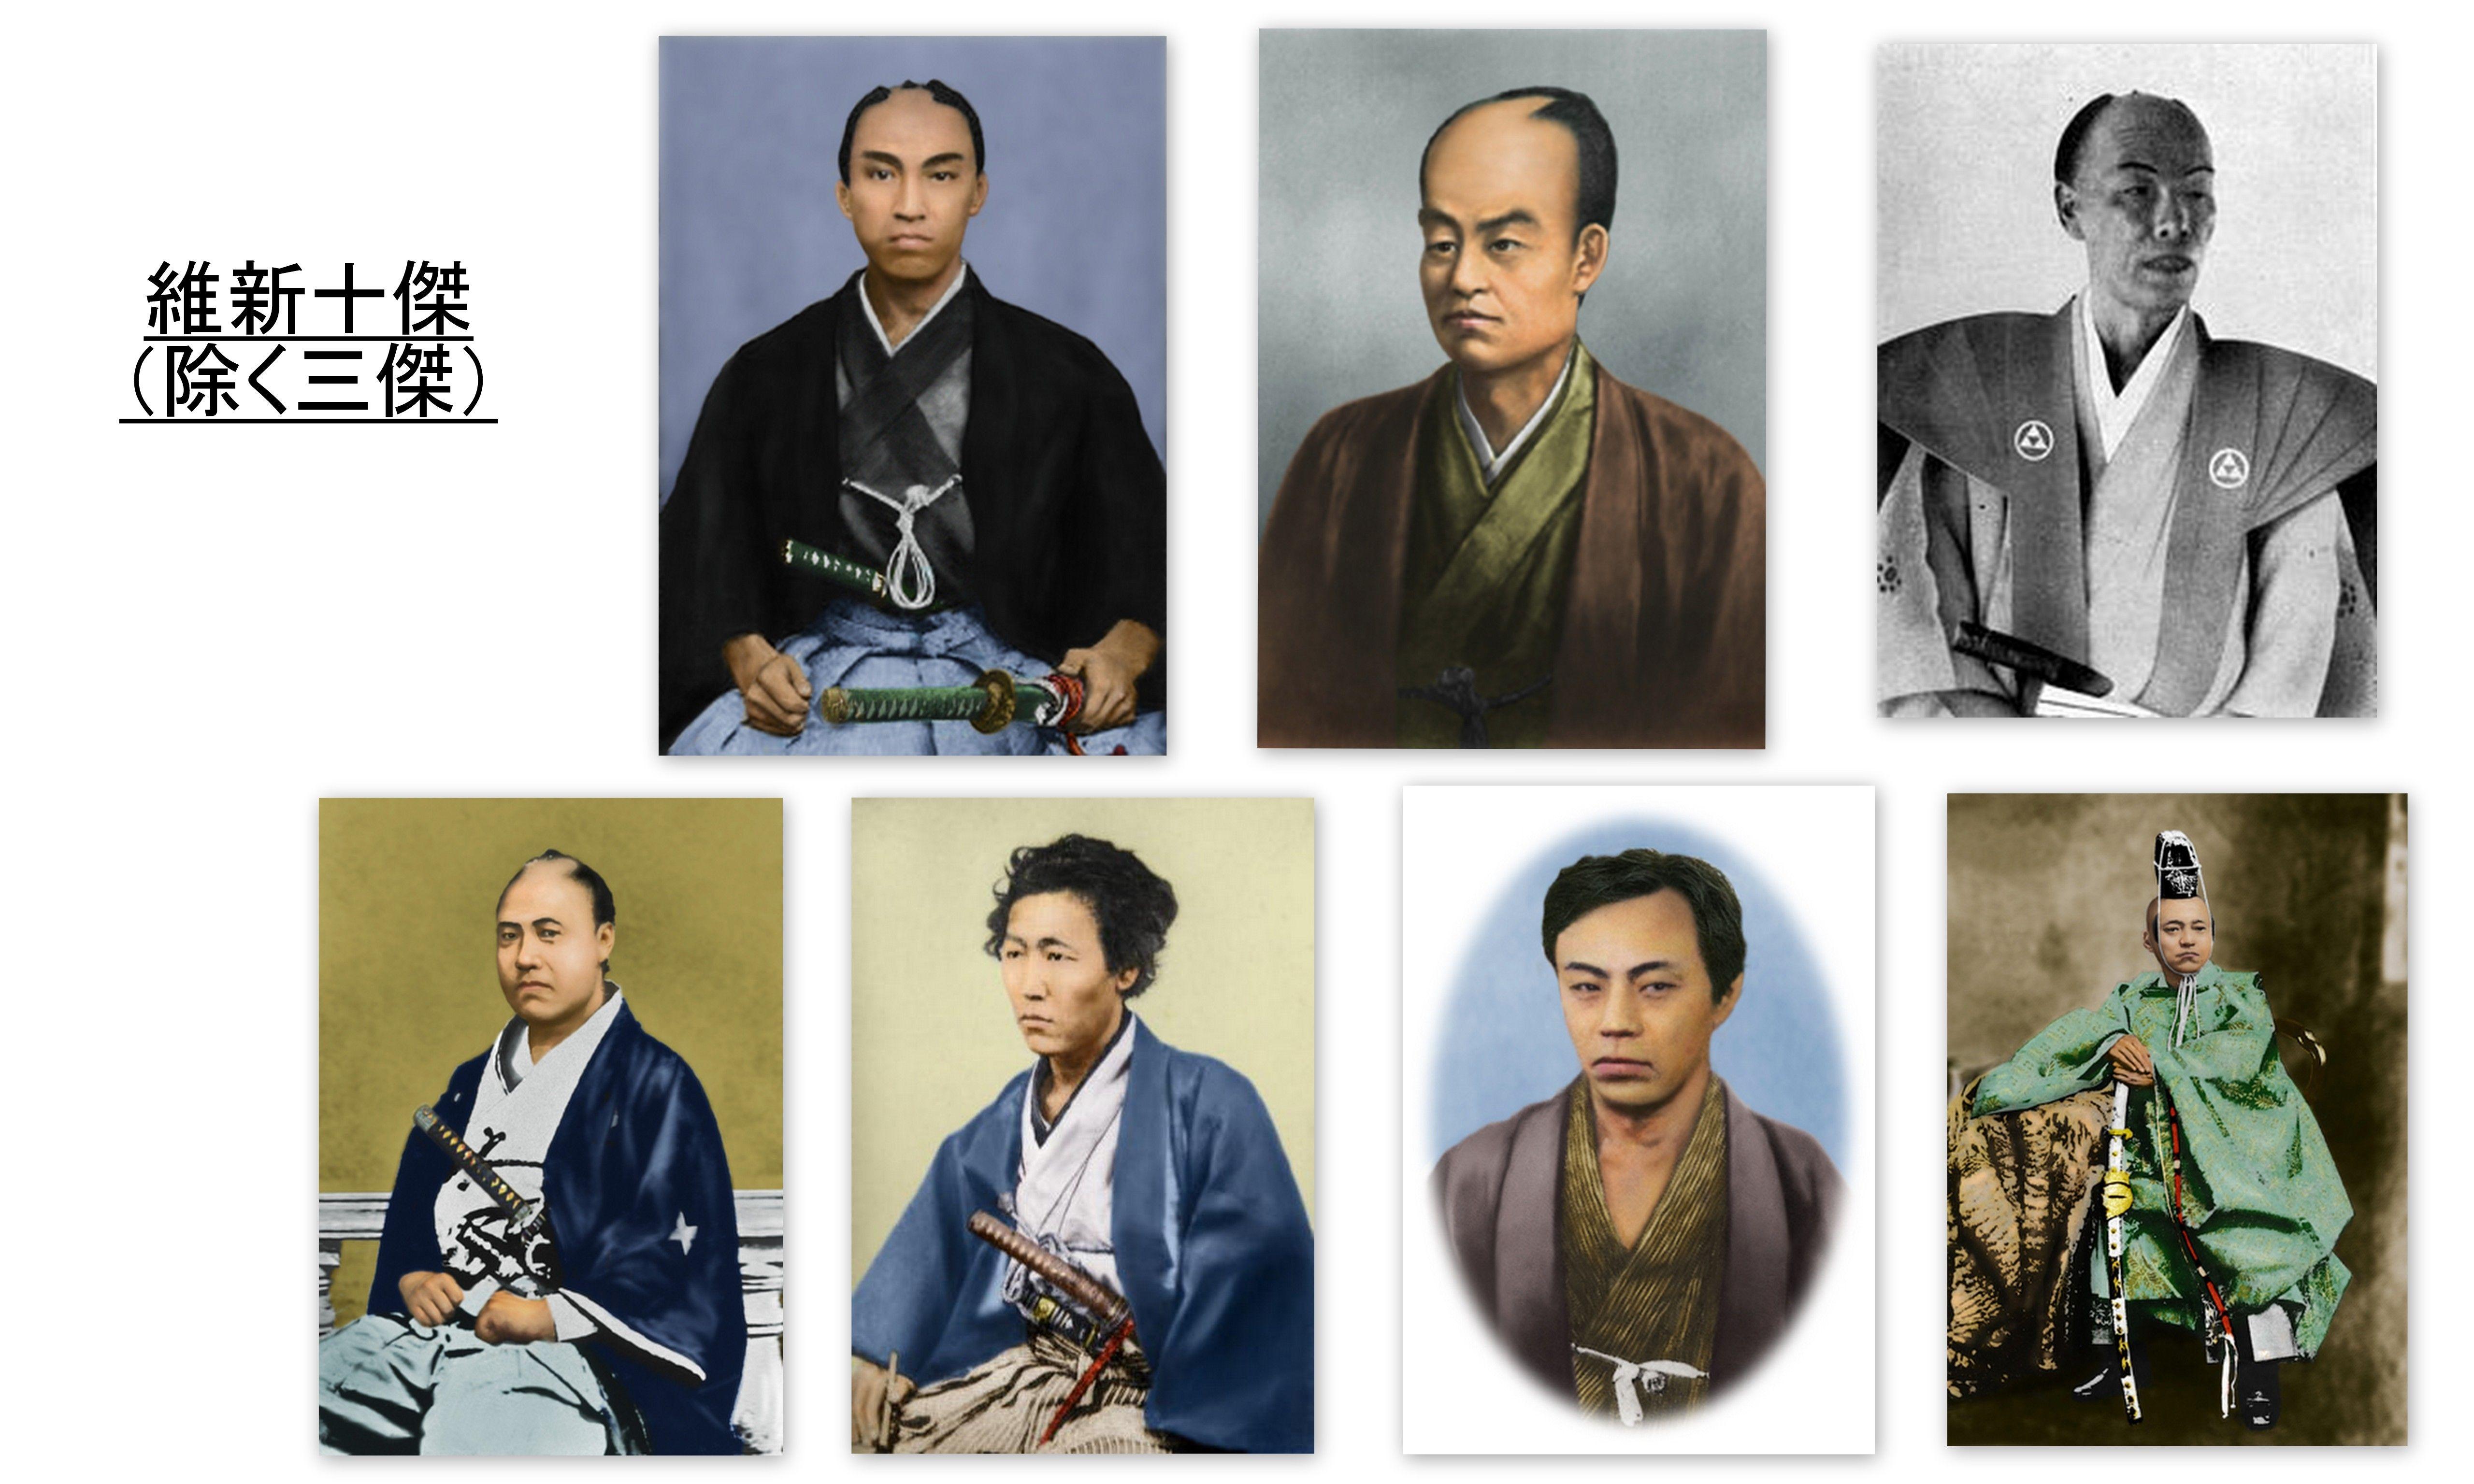 Musuis Story The Autobiography of a Tokugawa Samurai